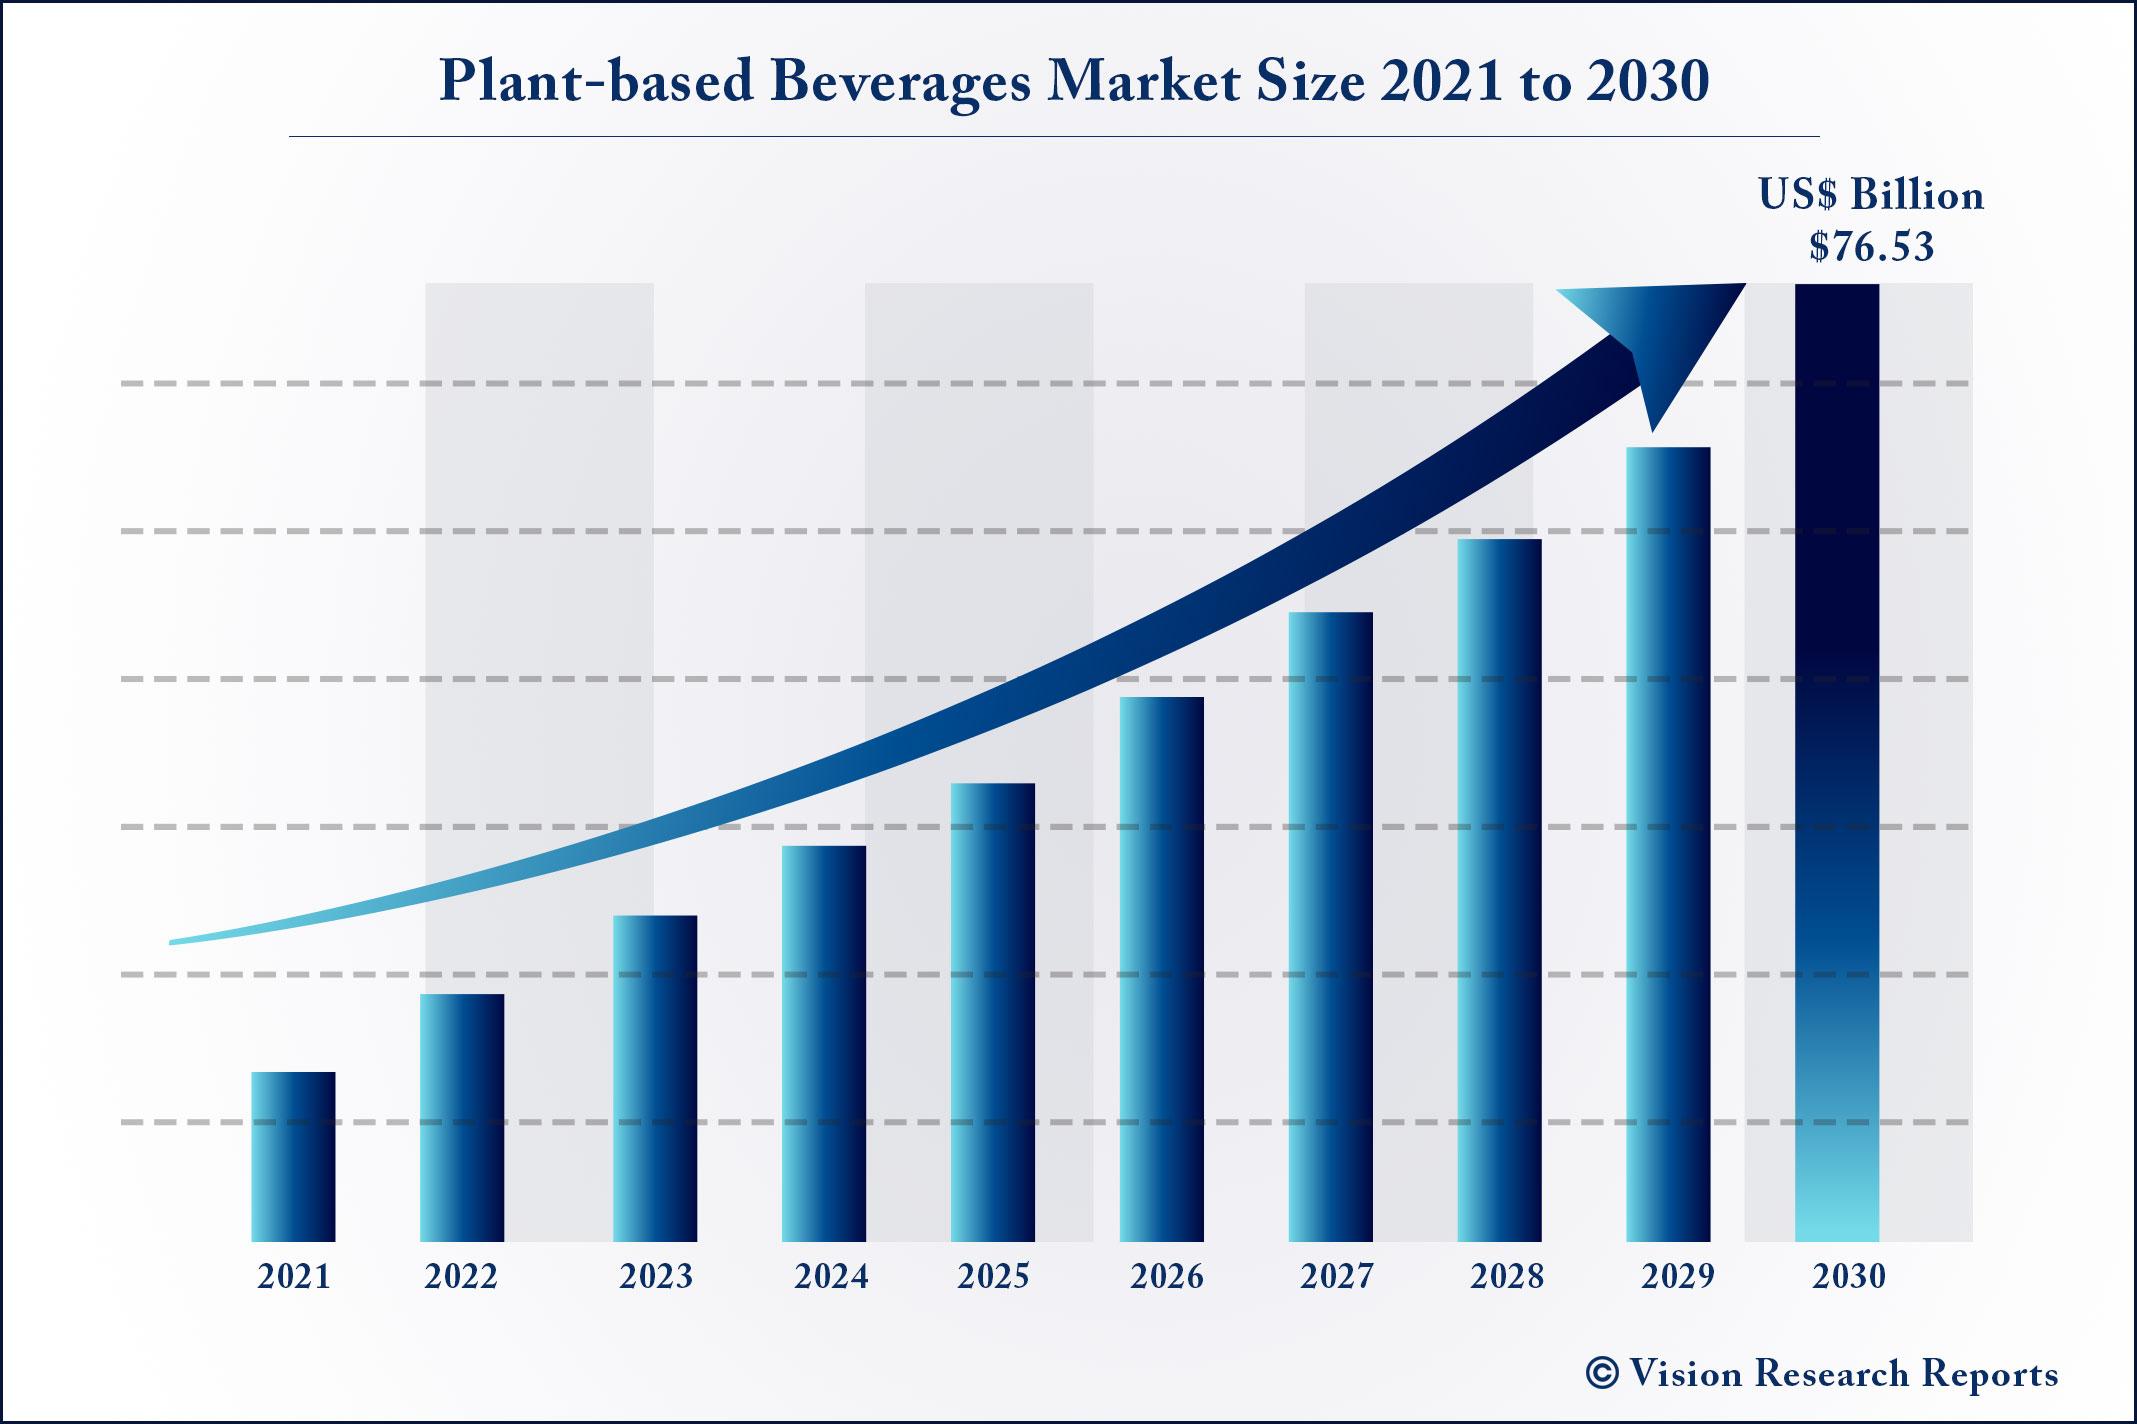 Plant-based Beverages Market Size 2021 to 2030